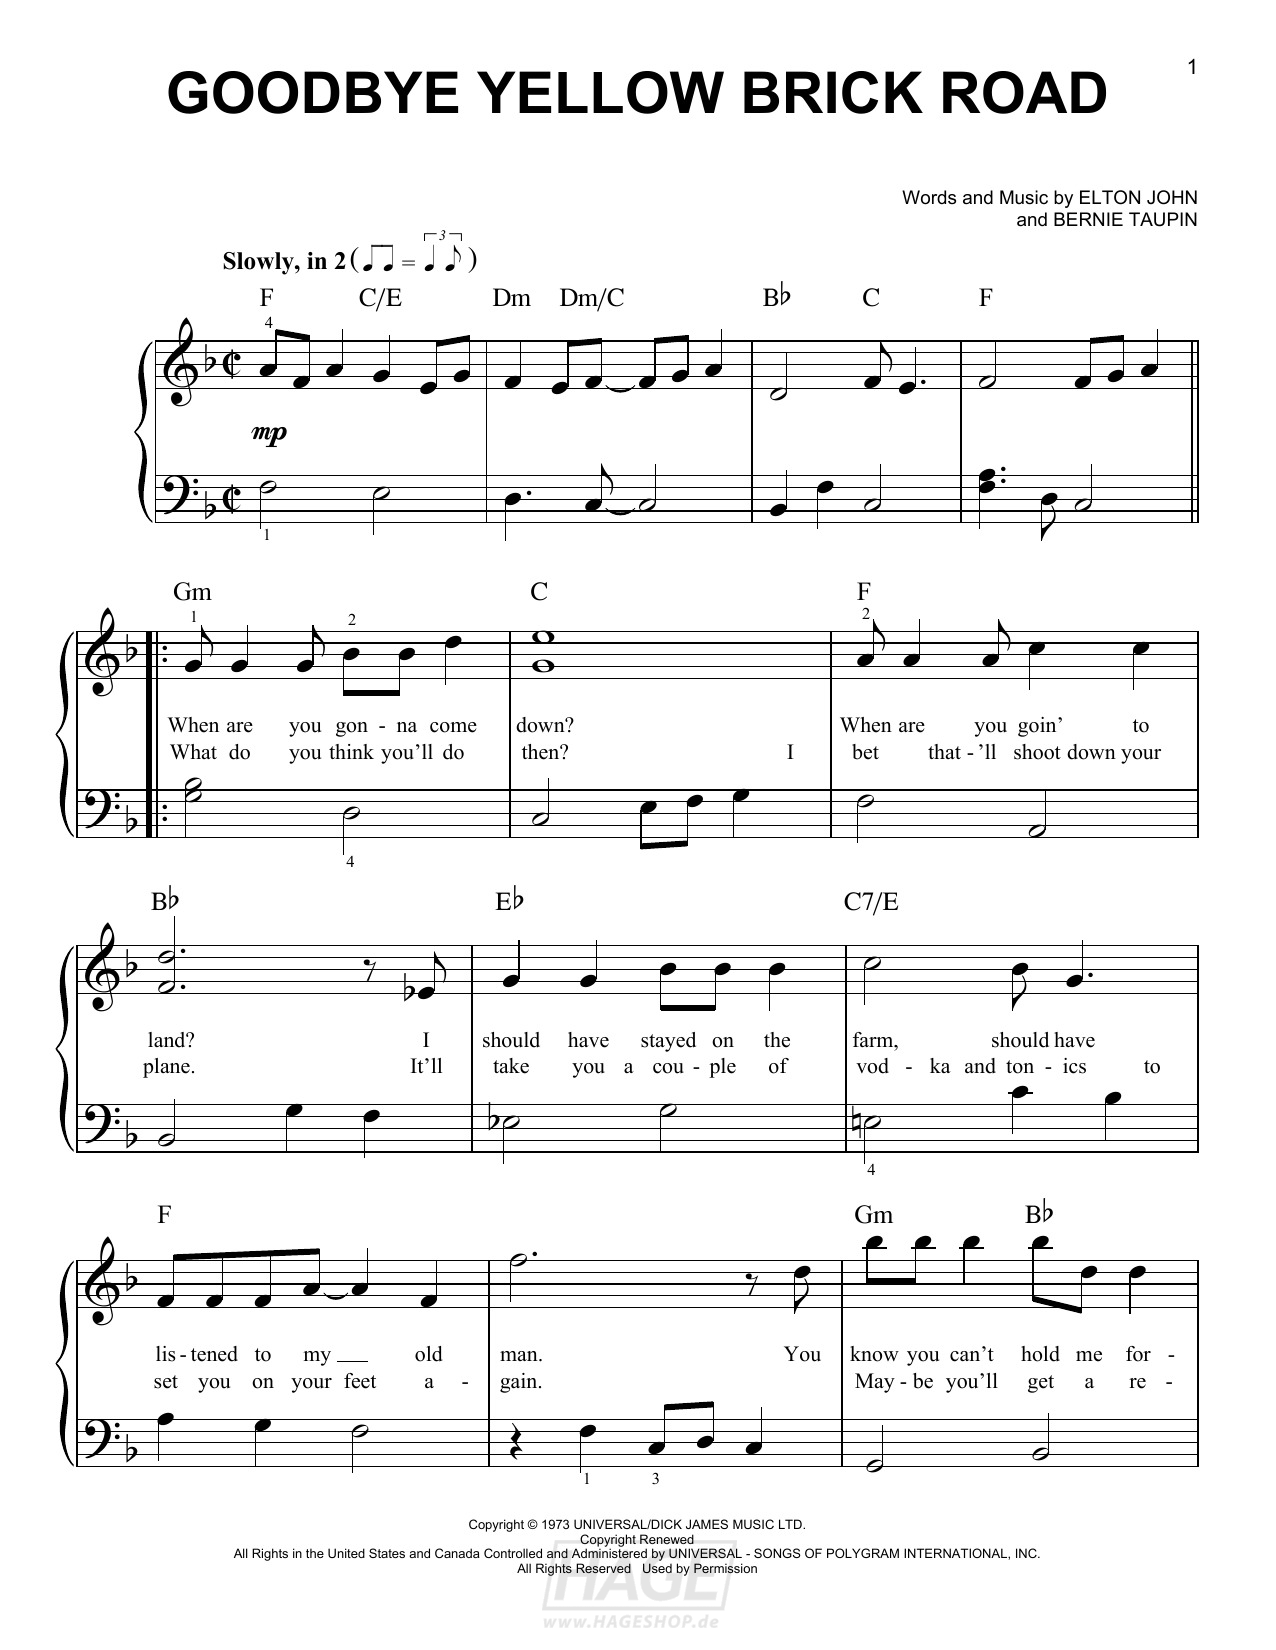 Goodbye Yellow Brick Road - Elton John - Noten Druckvorschau